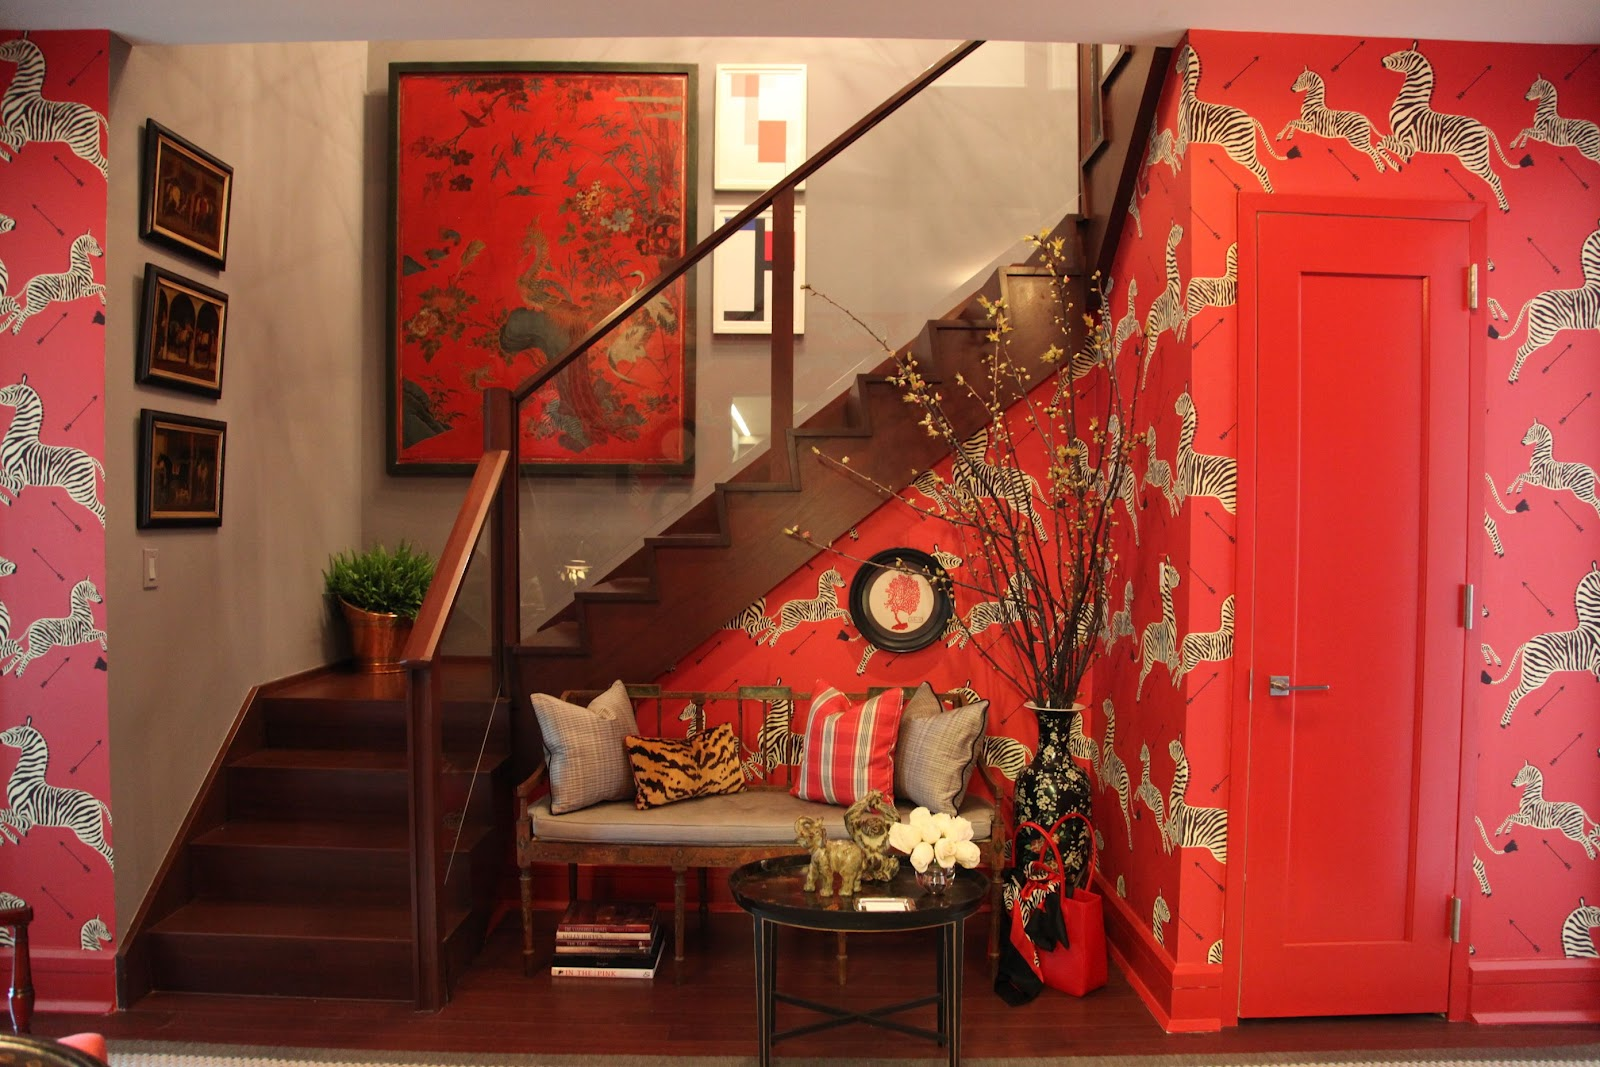 http://2.bp.blogspot.com/-jsSVA5QafzE/T7UL3SCO4XI/AAAAAAAAs4U/T14Bs-qZJHw/s1600/kips+bay+show+house+2012+habituallychic+001.jpg